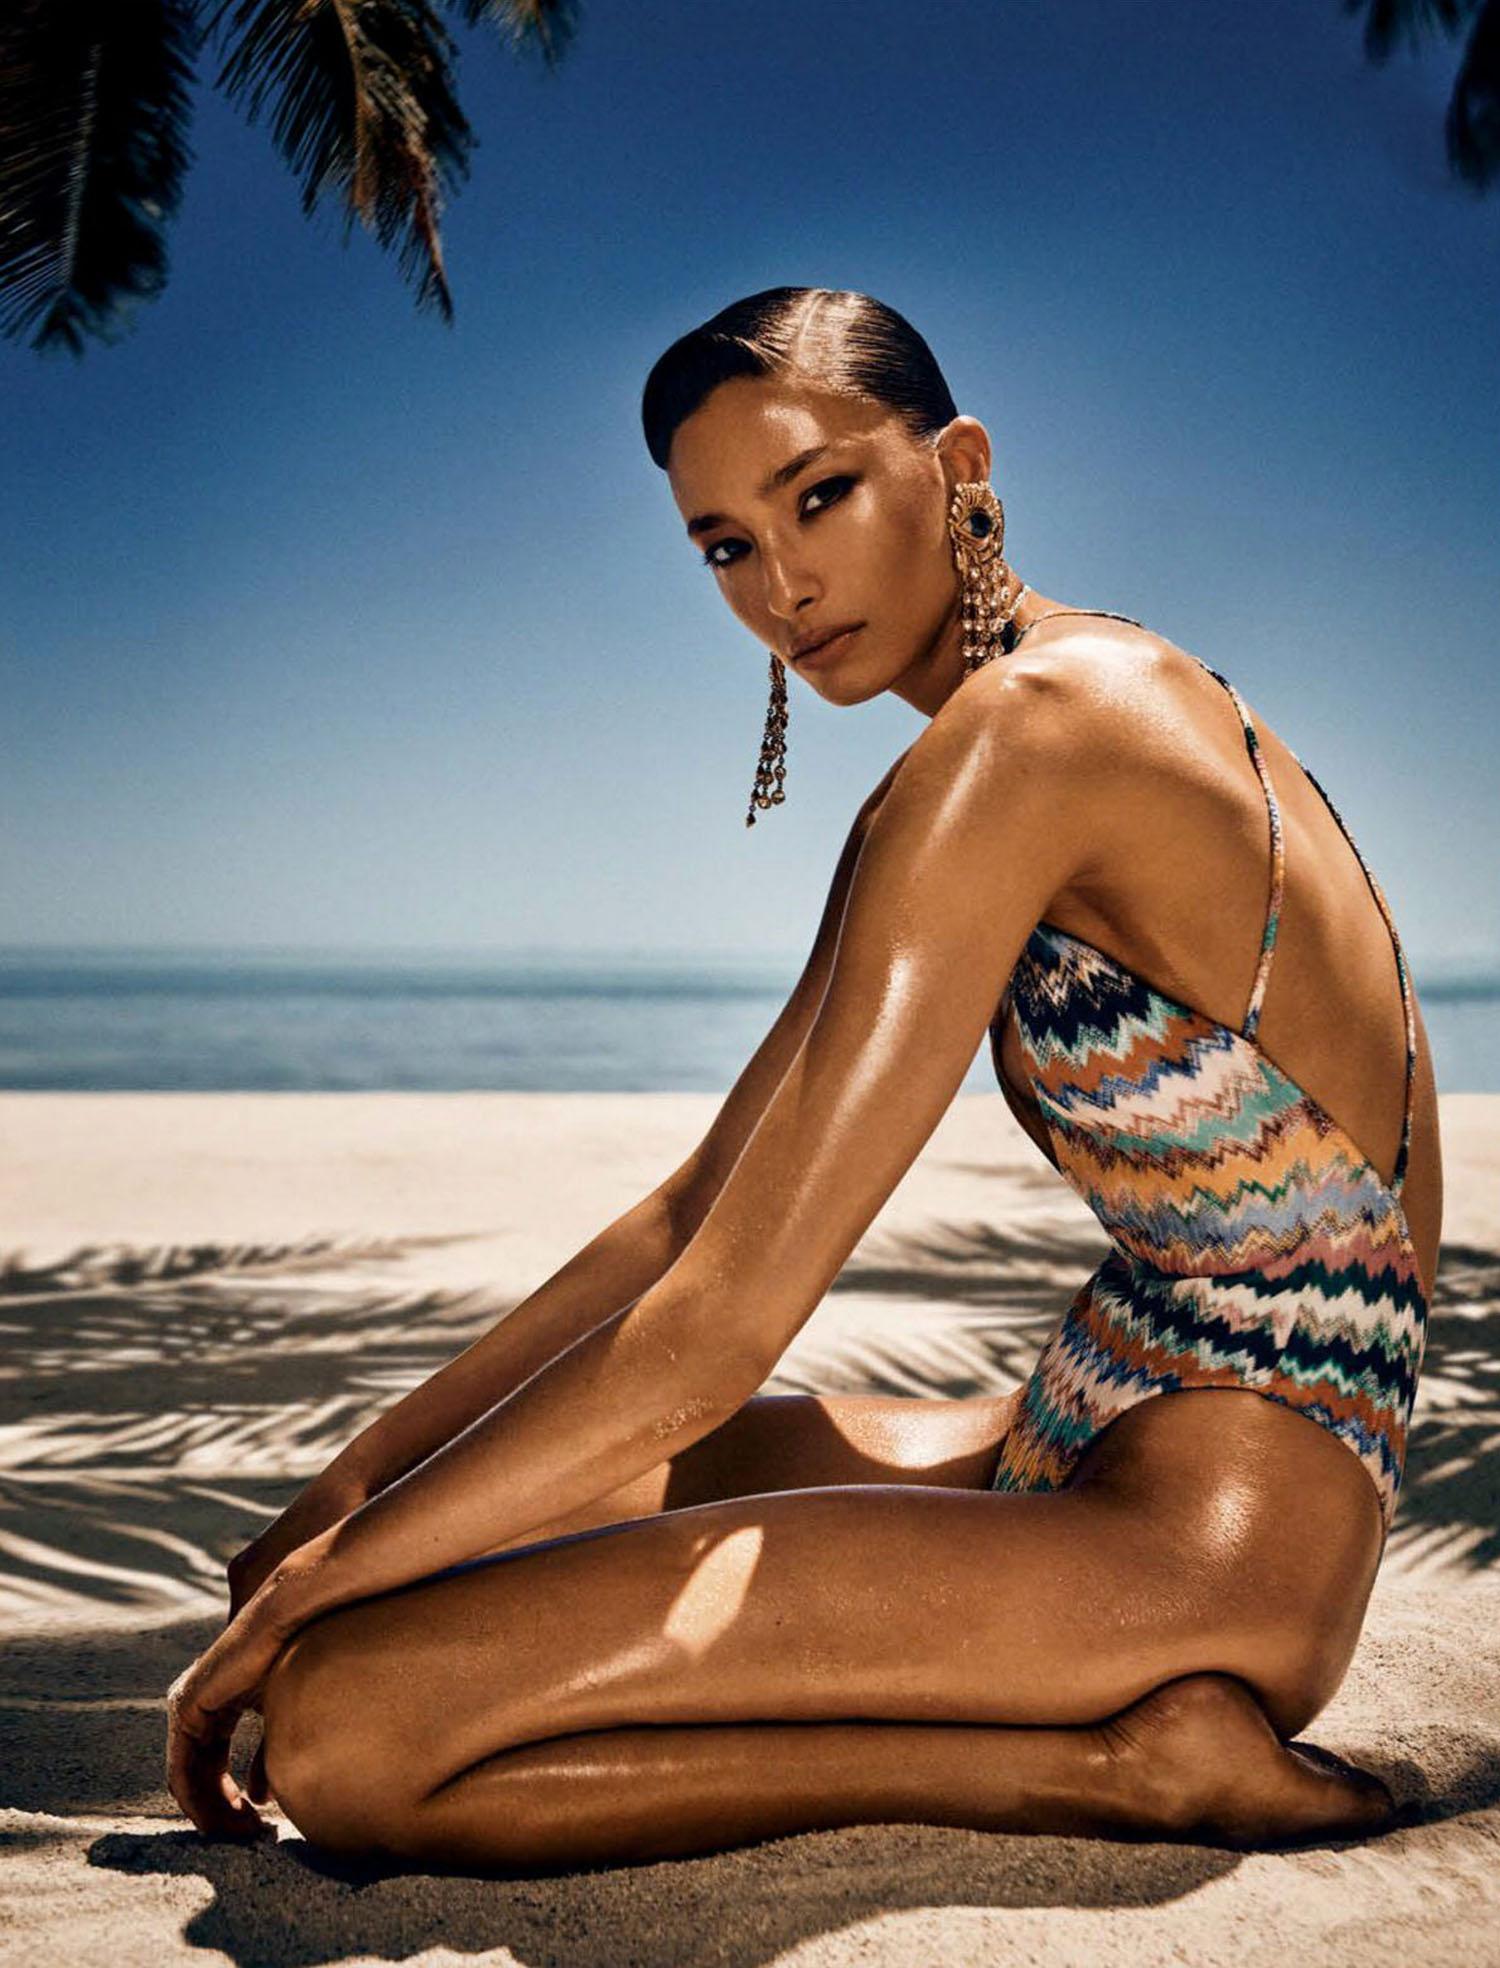 Alexandra Agoston by Yulia Gorbachenko for Vogue Mexico & Latin America July 2021